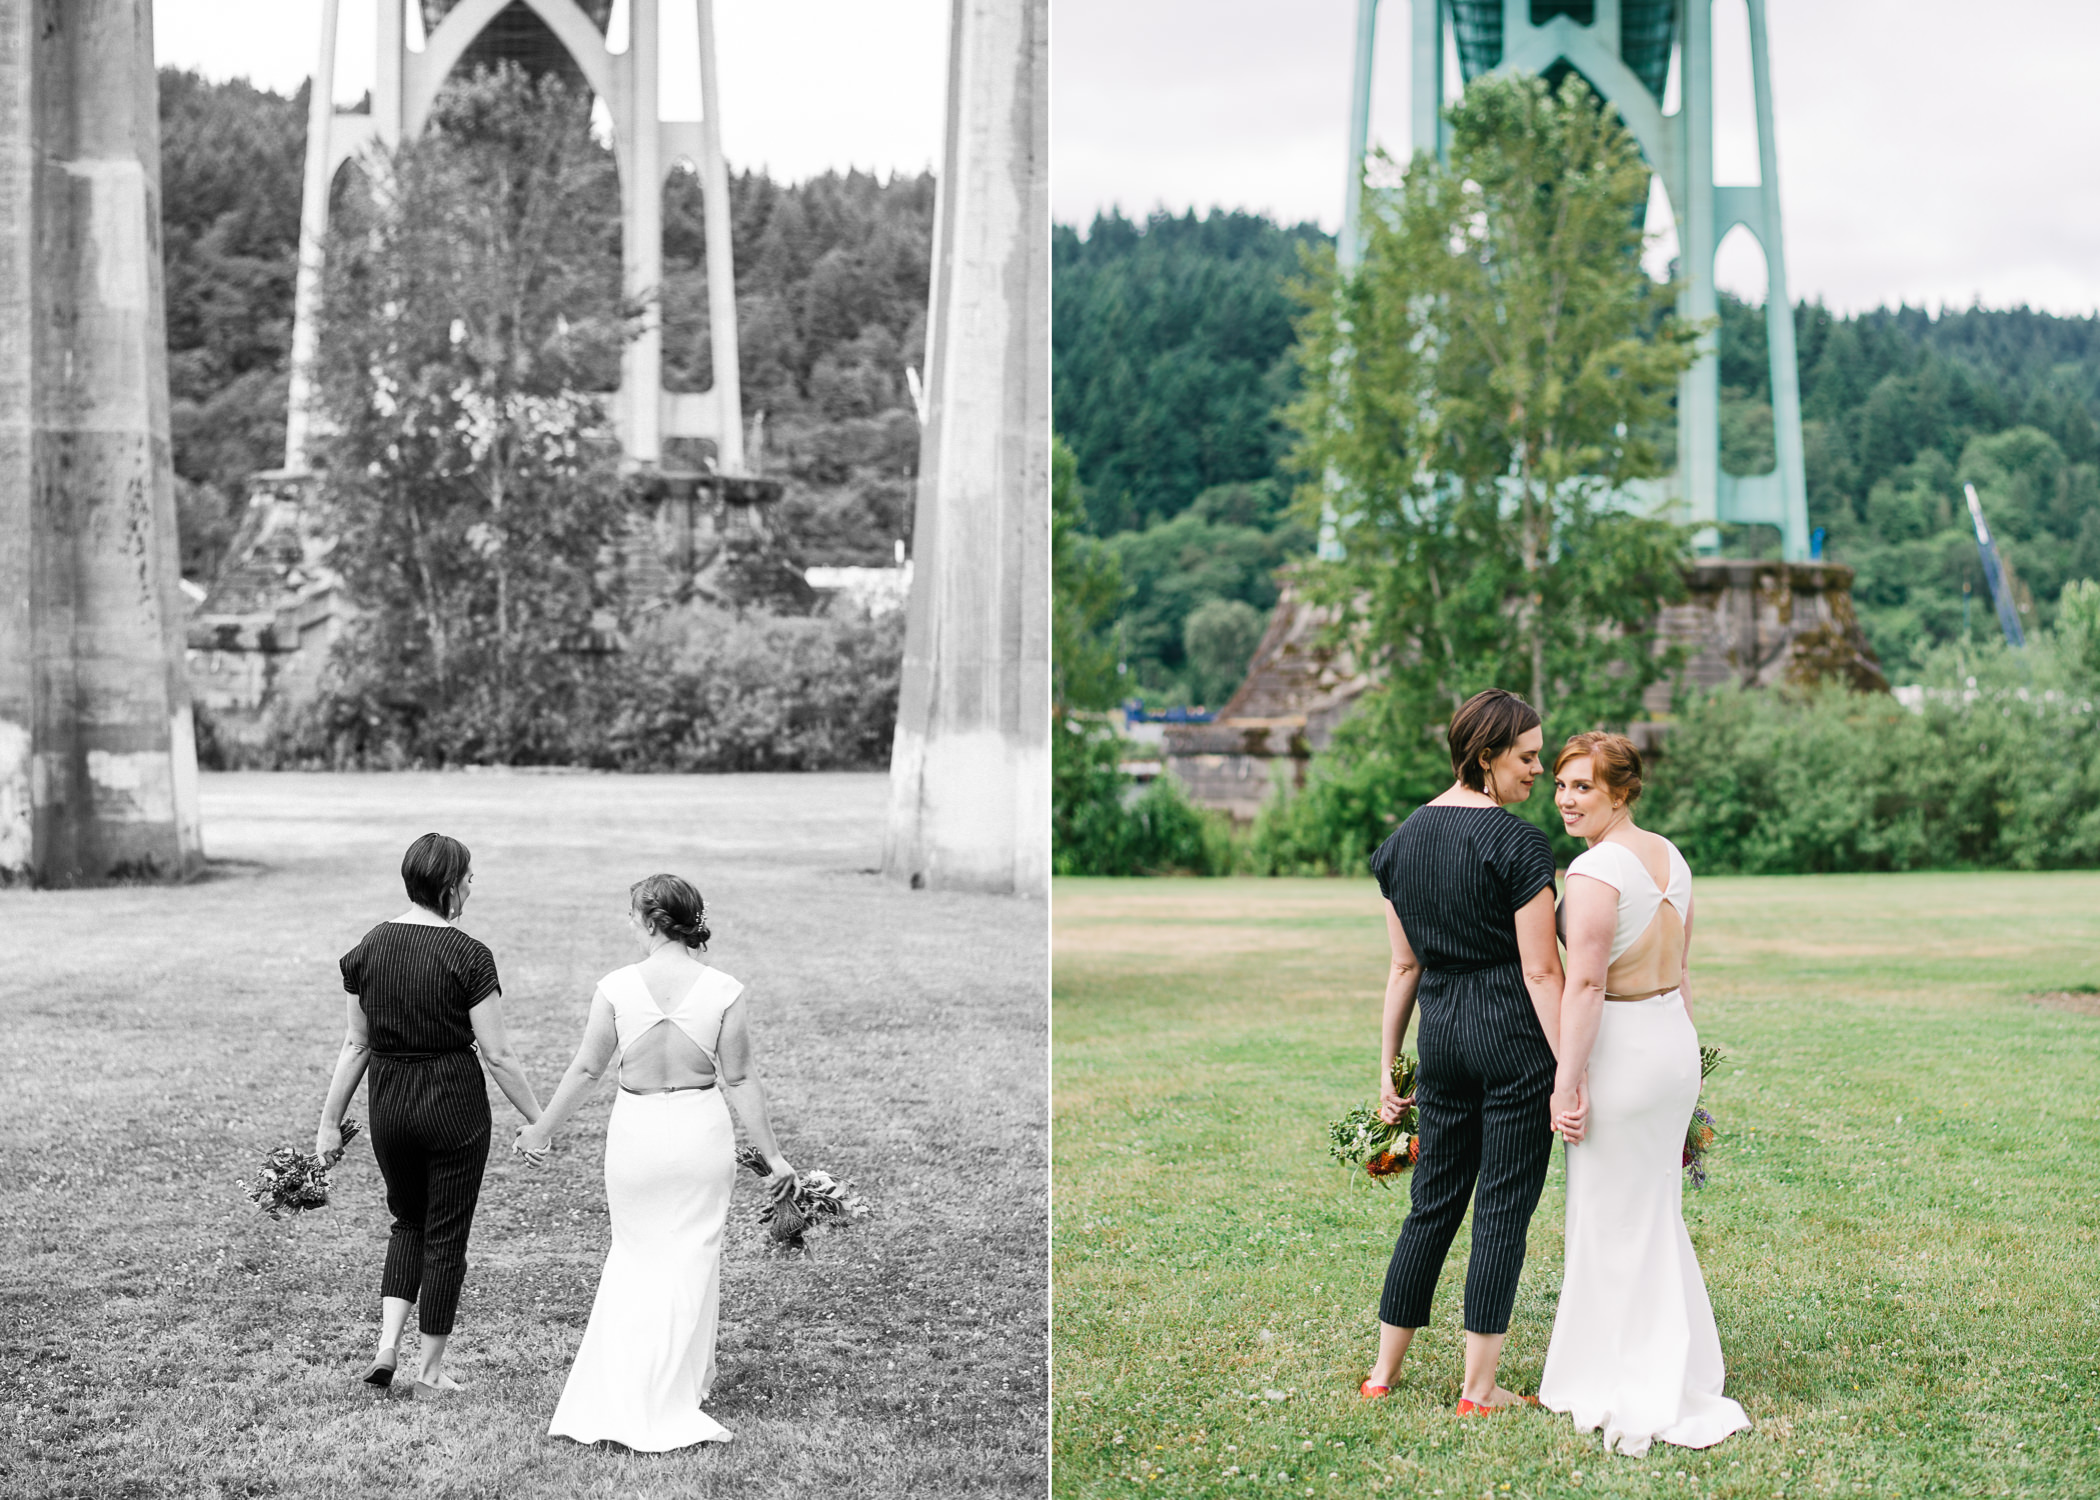 cathedral-park-portland-elopement-gay-wedding-056.JPG